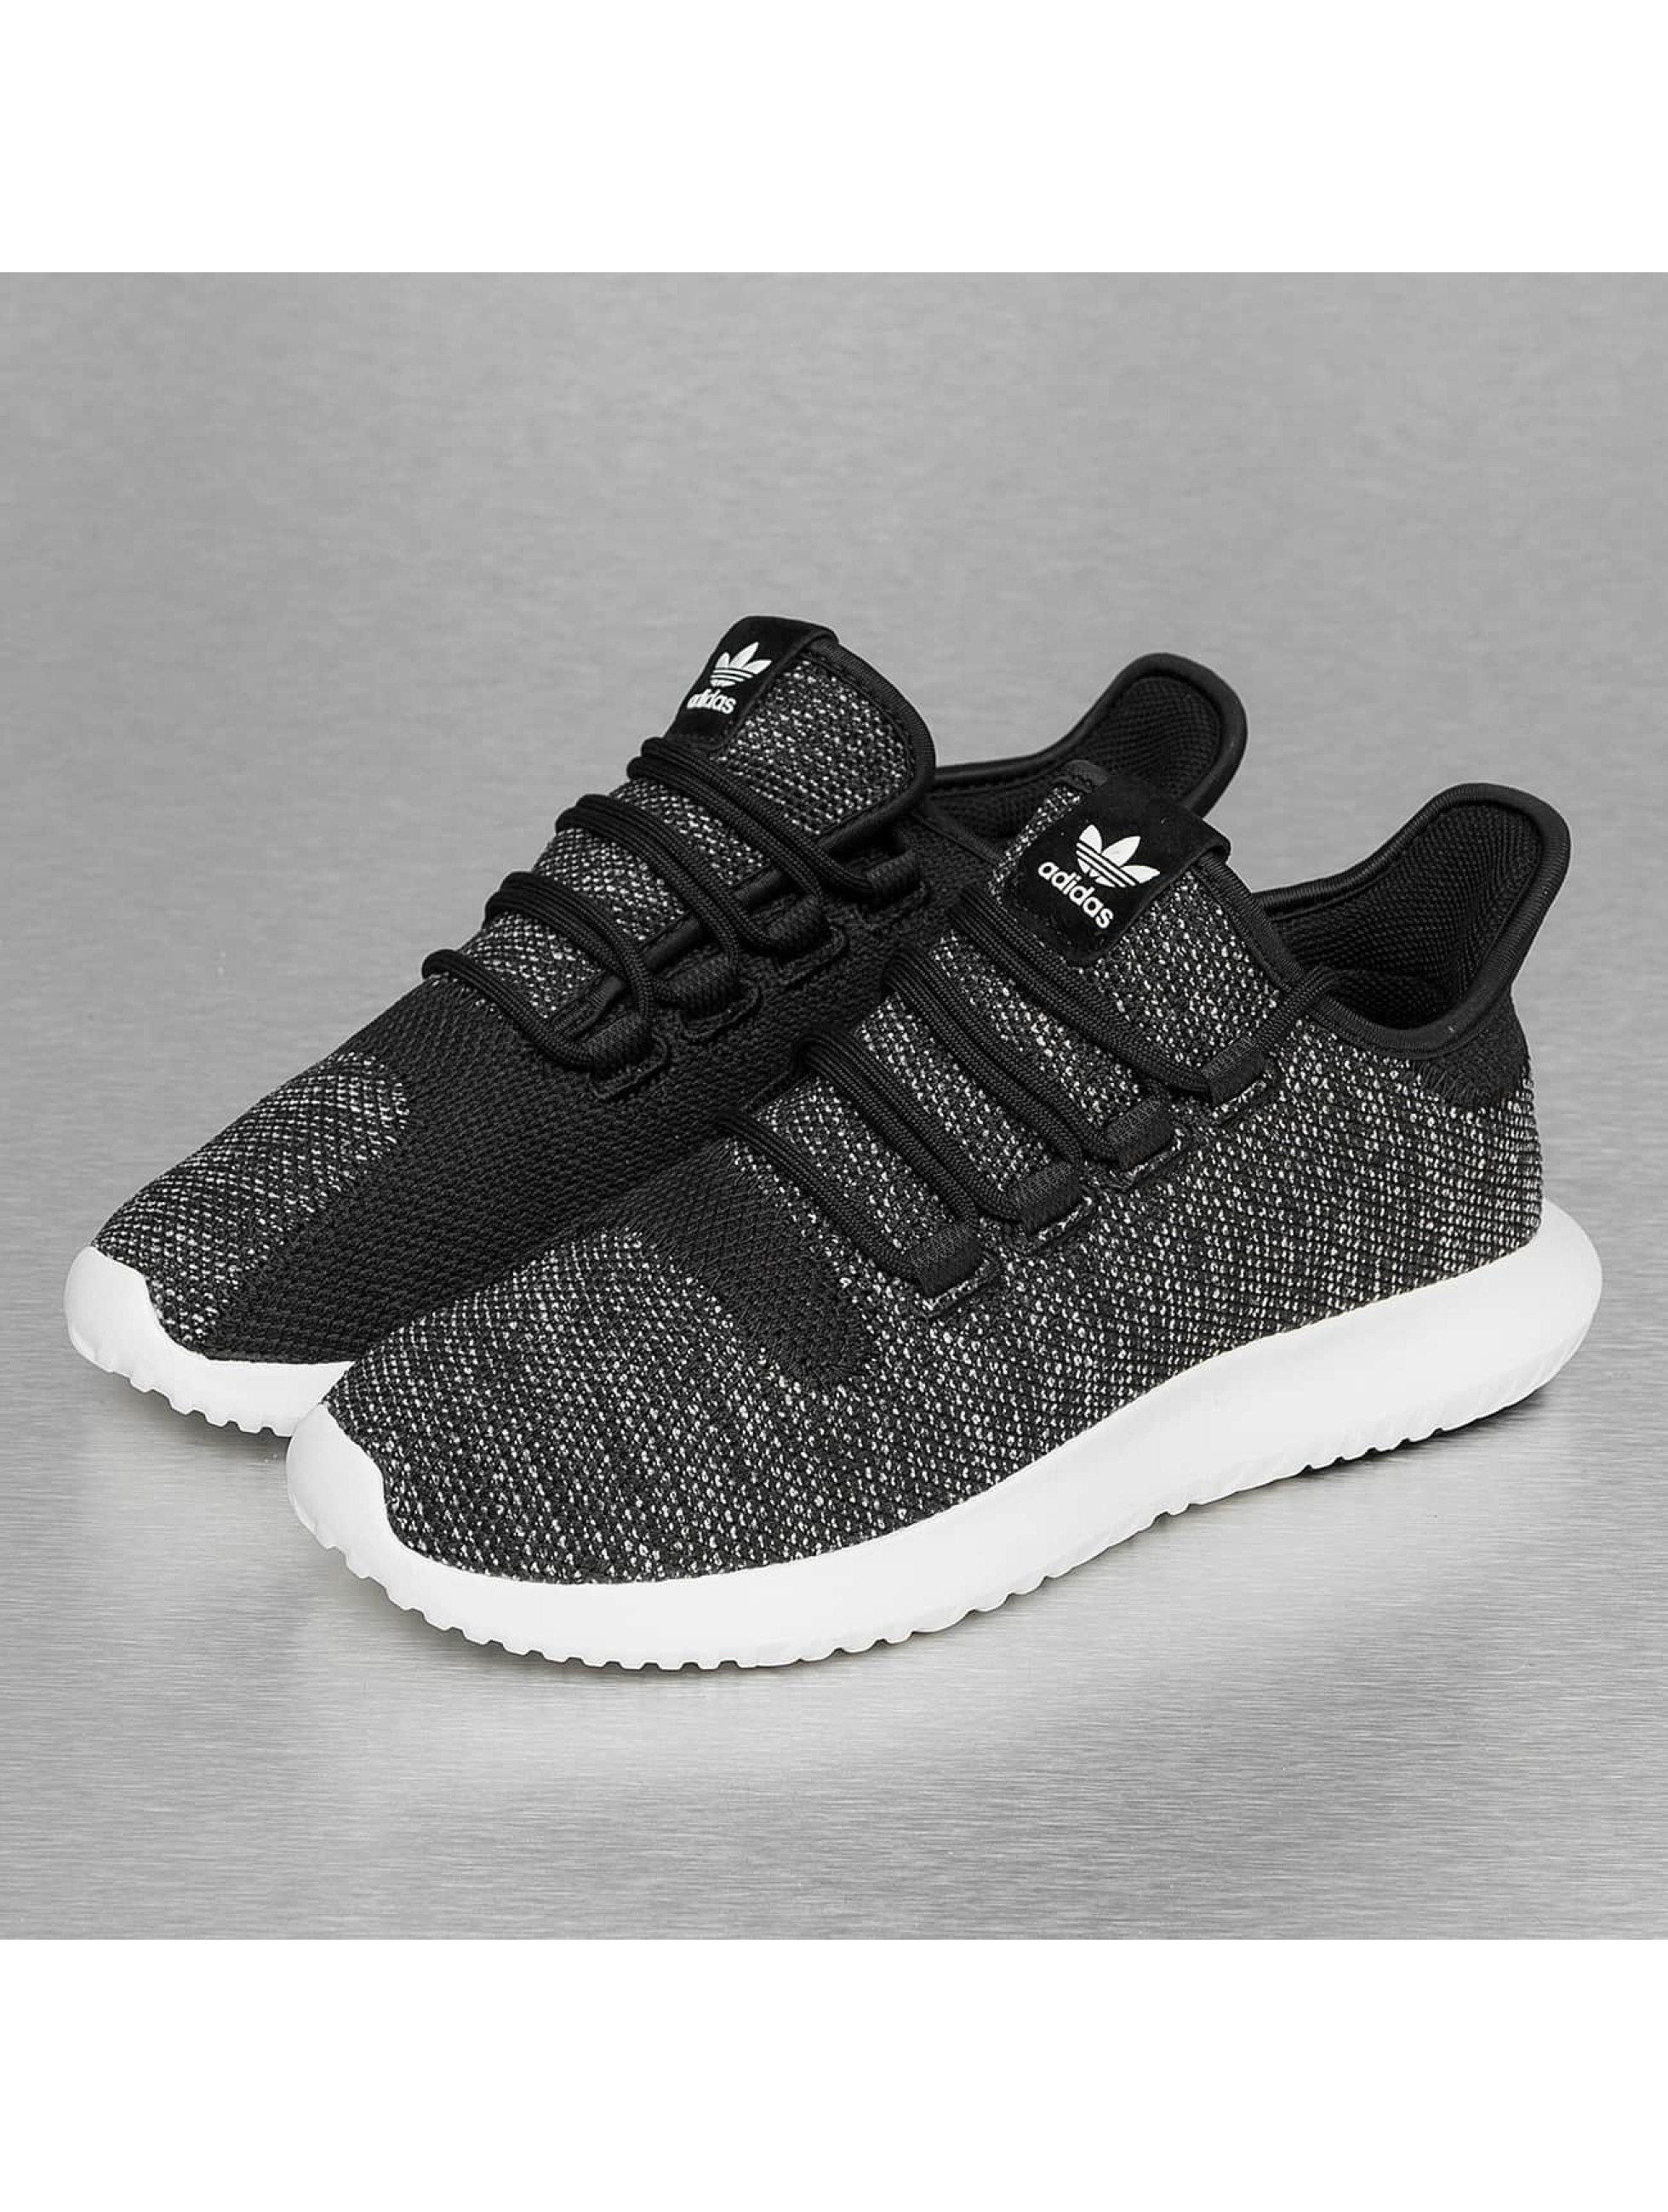 reputable site 5798e dac4e ... real nike damen adidas tubular runner w schwarz schwarz schwarz adidas  tubular runner schwarz blau 7d5bc